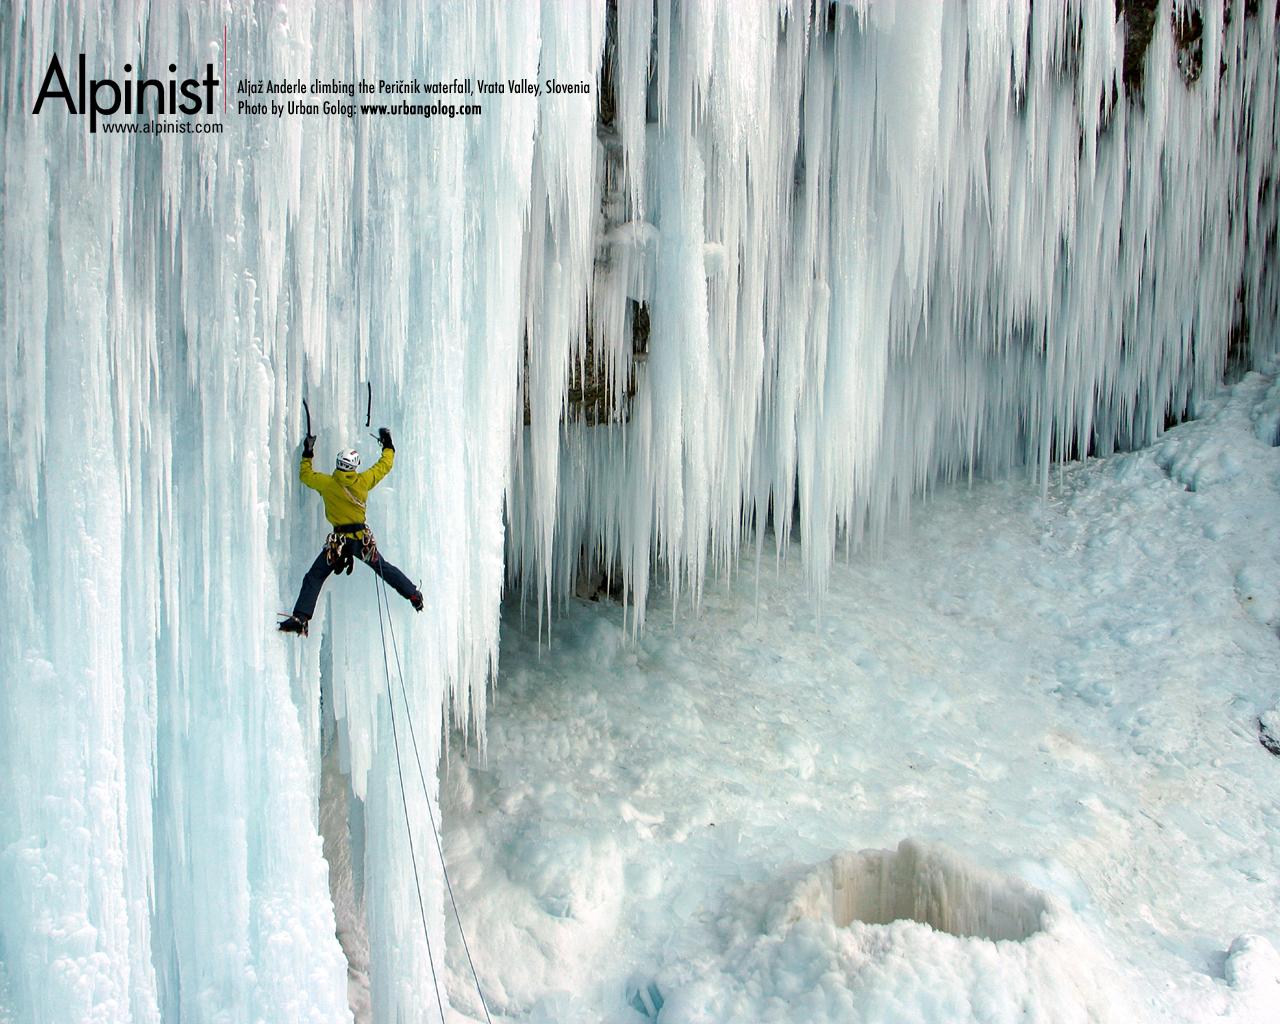 Amazing Falls Wallpaper Ice Climbing Wallpapers Hd Wallpapers Pulse